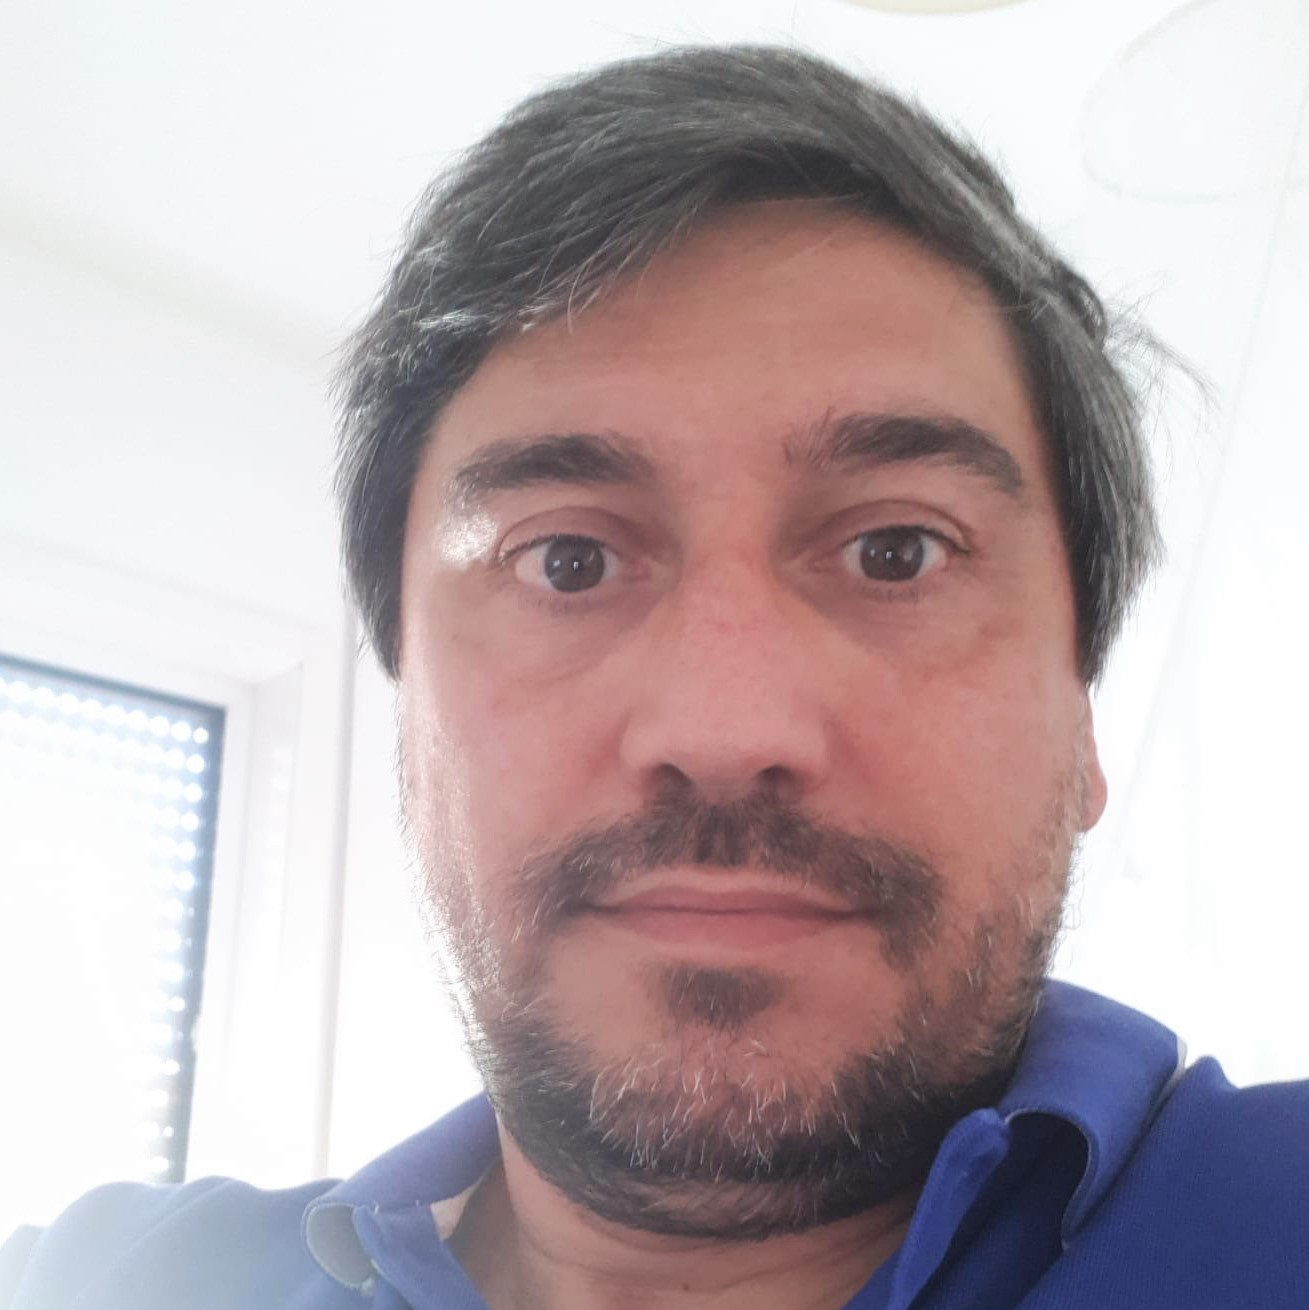 Pedro Ivo - Saint-Gobain